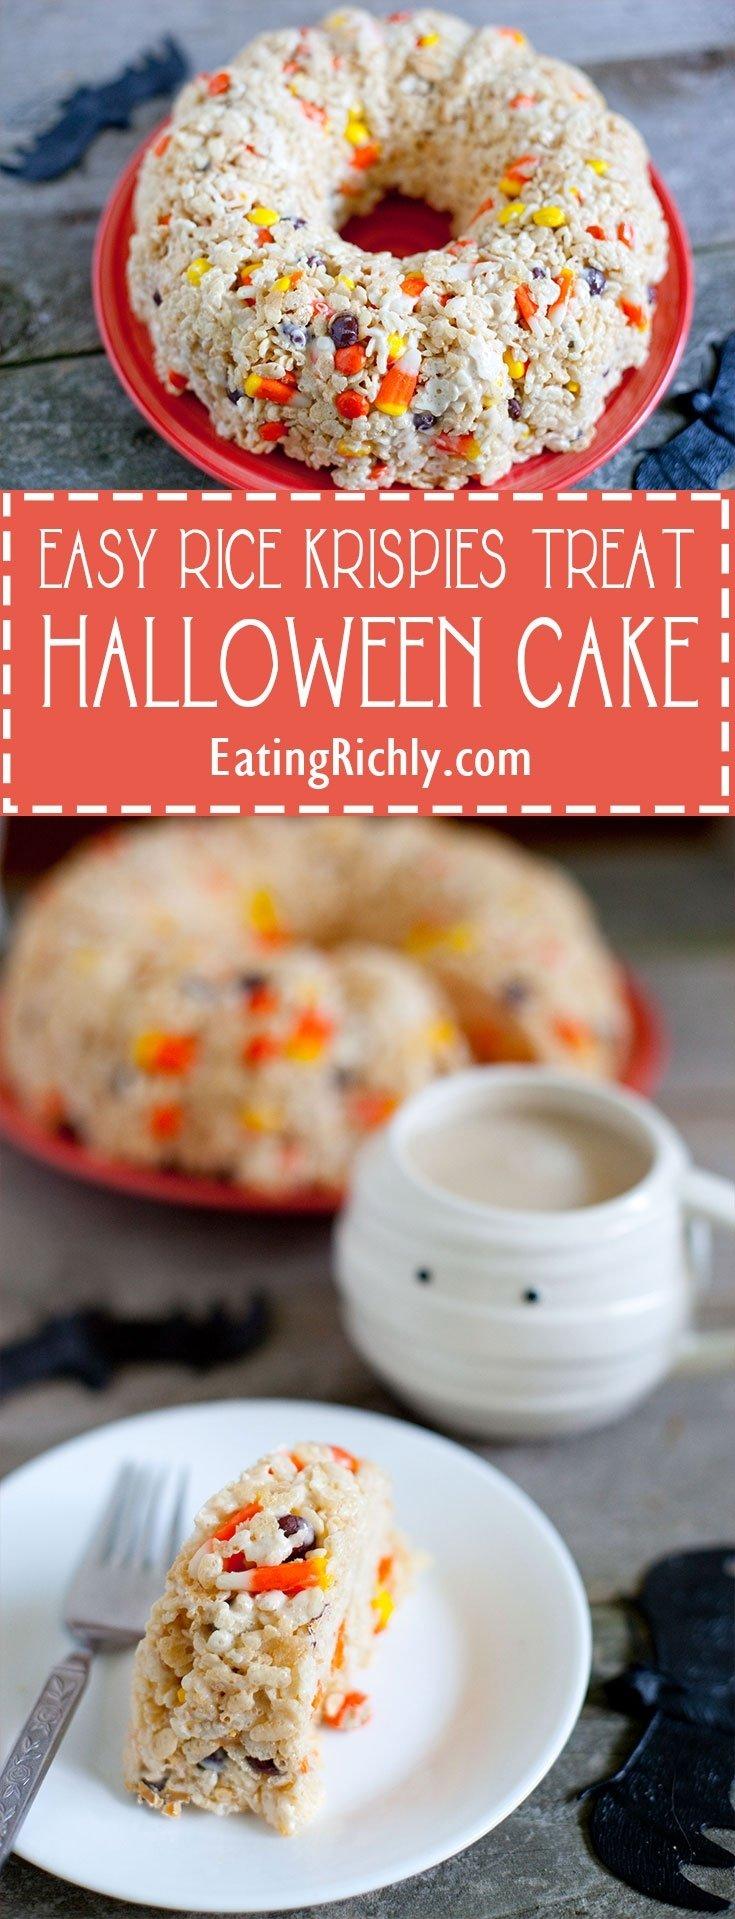 10 Great Halloween Rice Krispie Treat Ideas halloween rice krispie treat cake recipe eating richly 2020